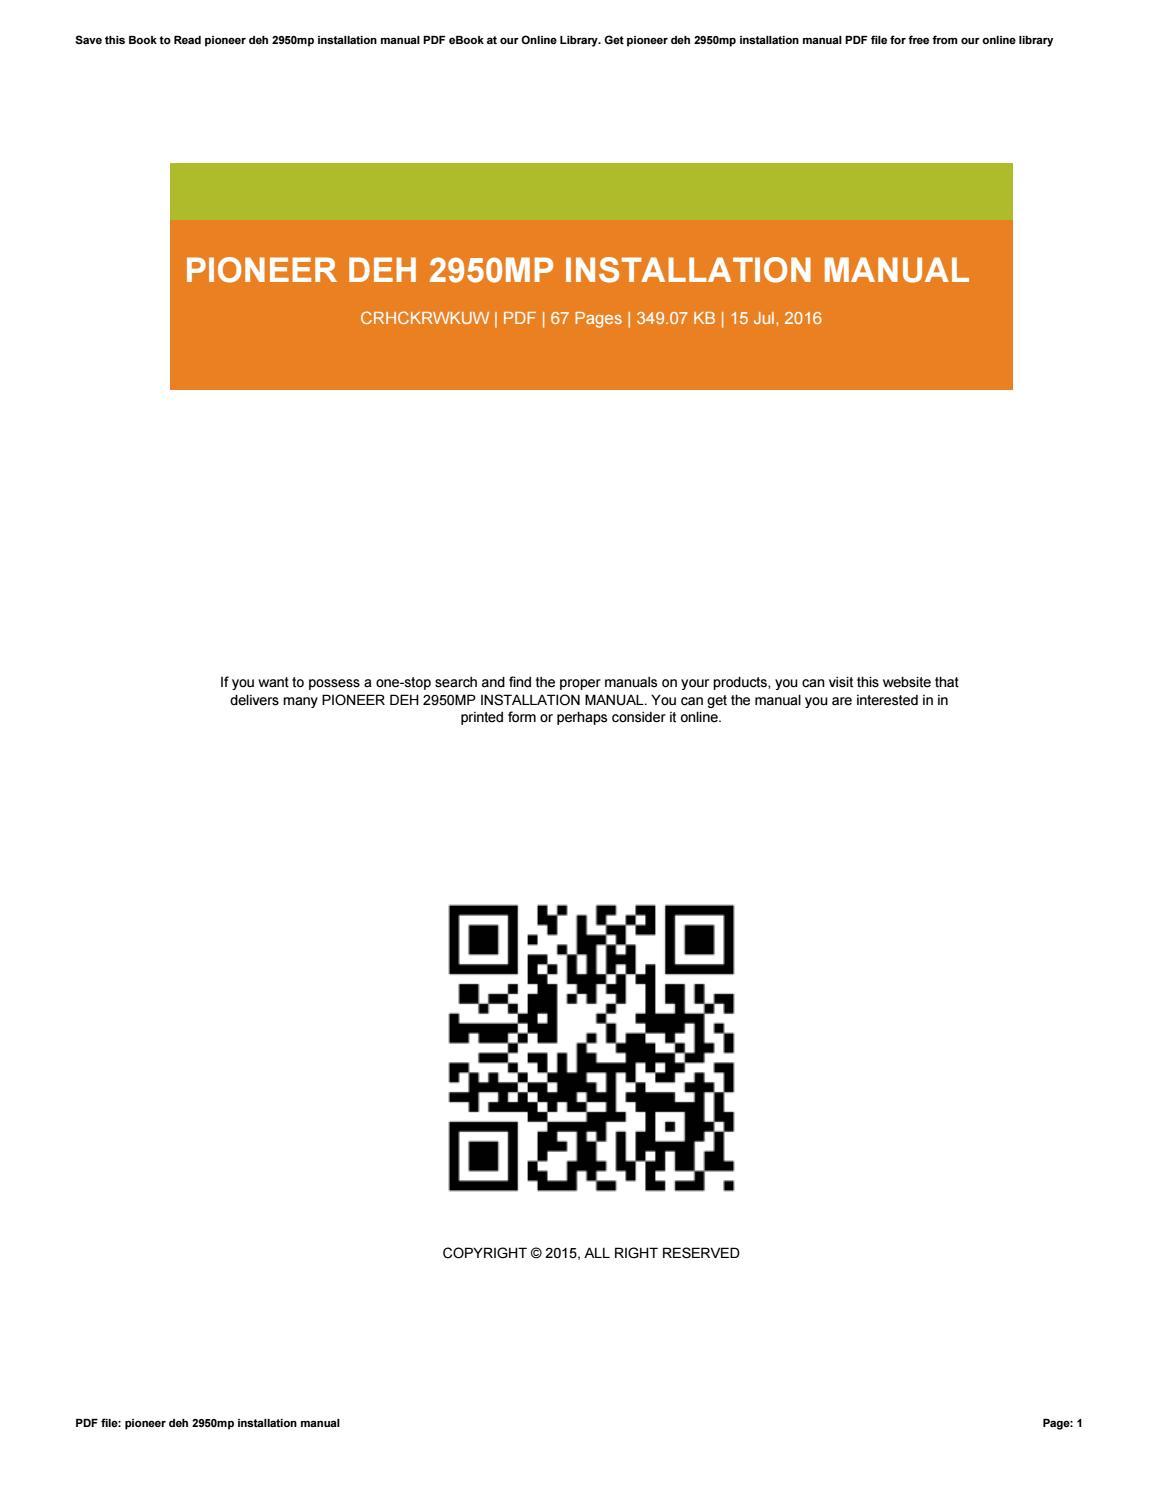 Pioneer deh-2950mp radio cd mp3 + leitor usb cartão sd youtube.